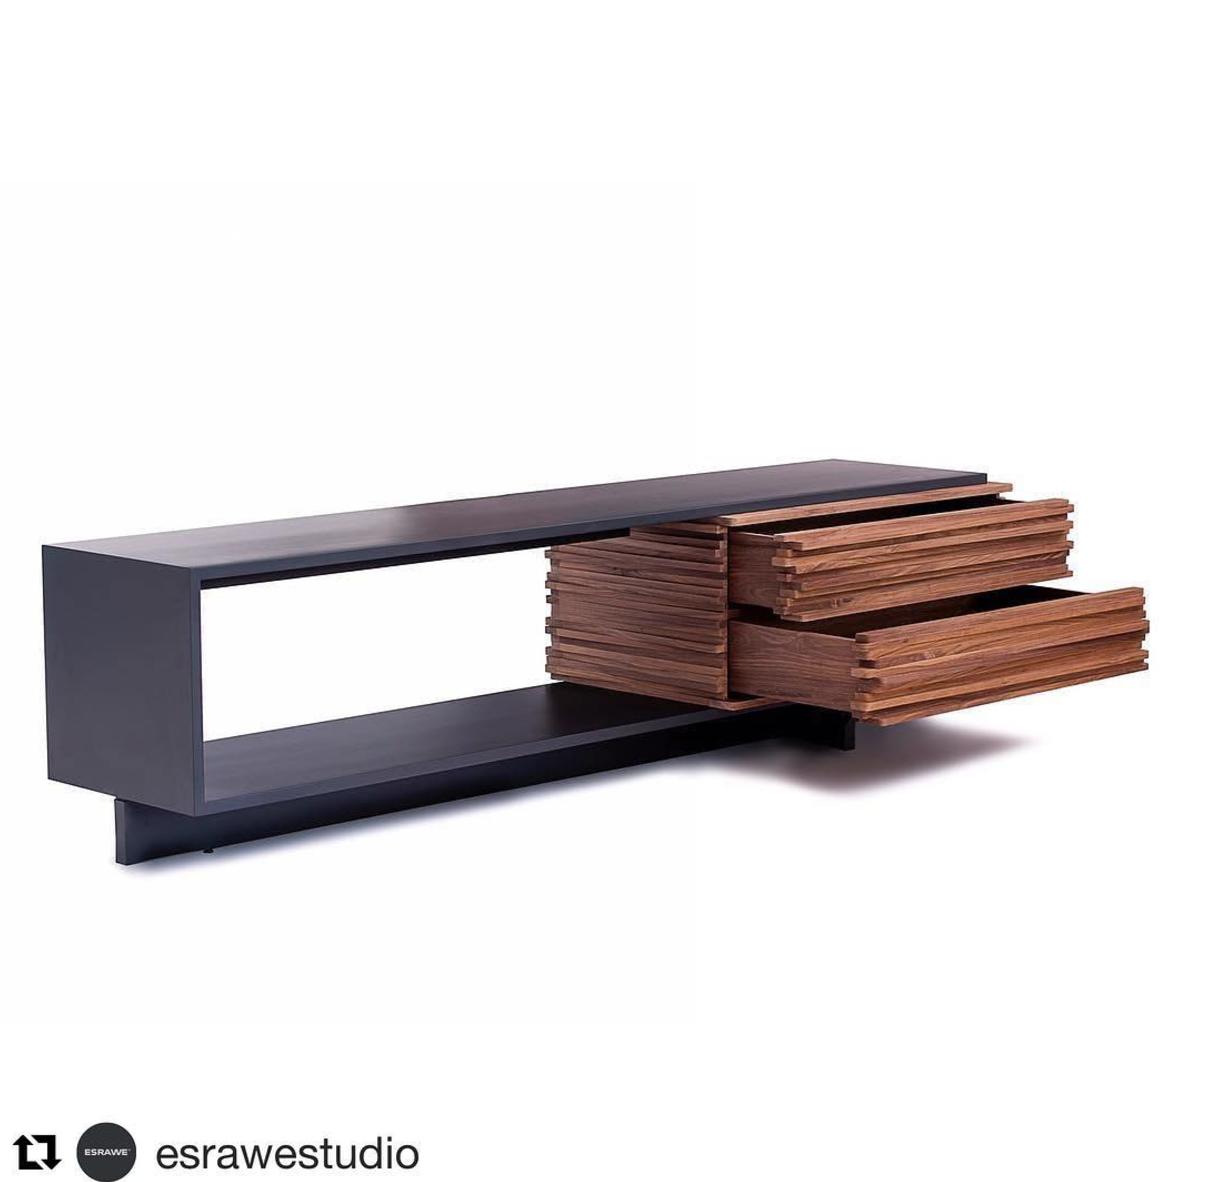 Bon Minimalist Wooden Sideboard By Hector Esrawe